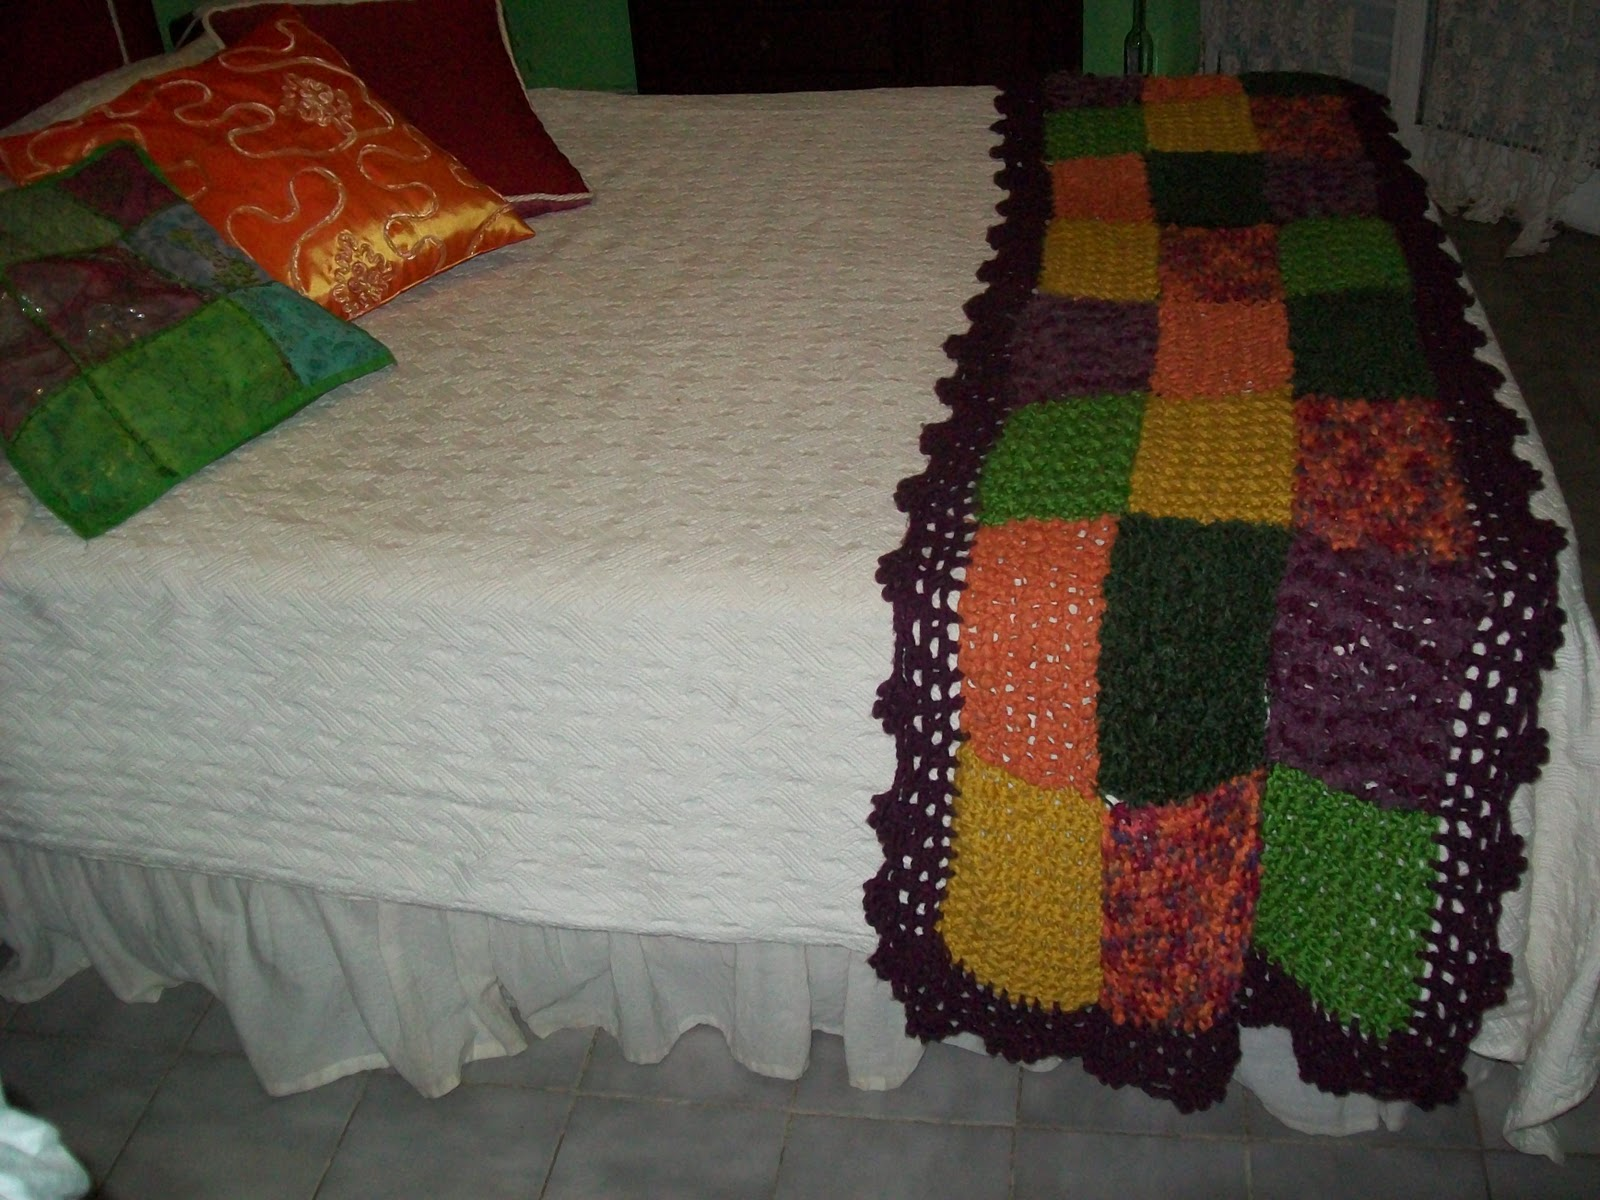 Abuela cata tejido de dise o marzo 2011 - Alfombras pie de cama ...